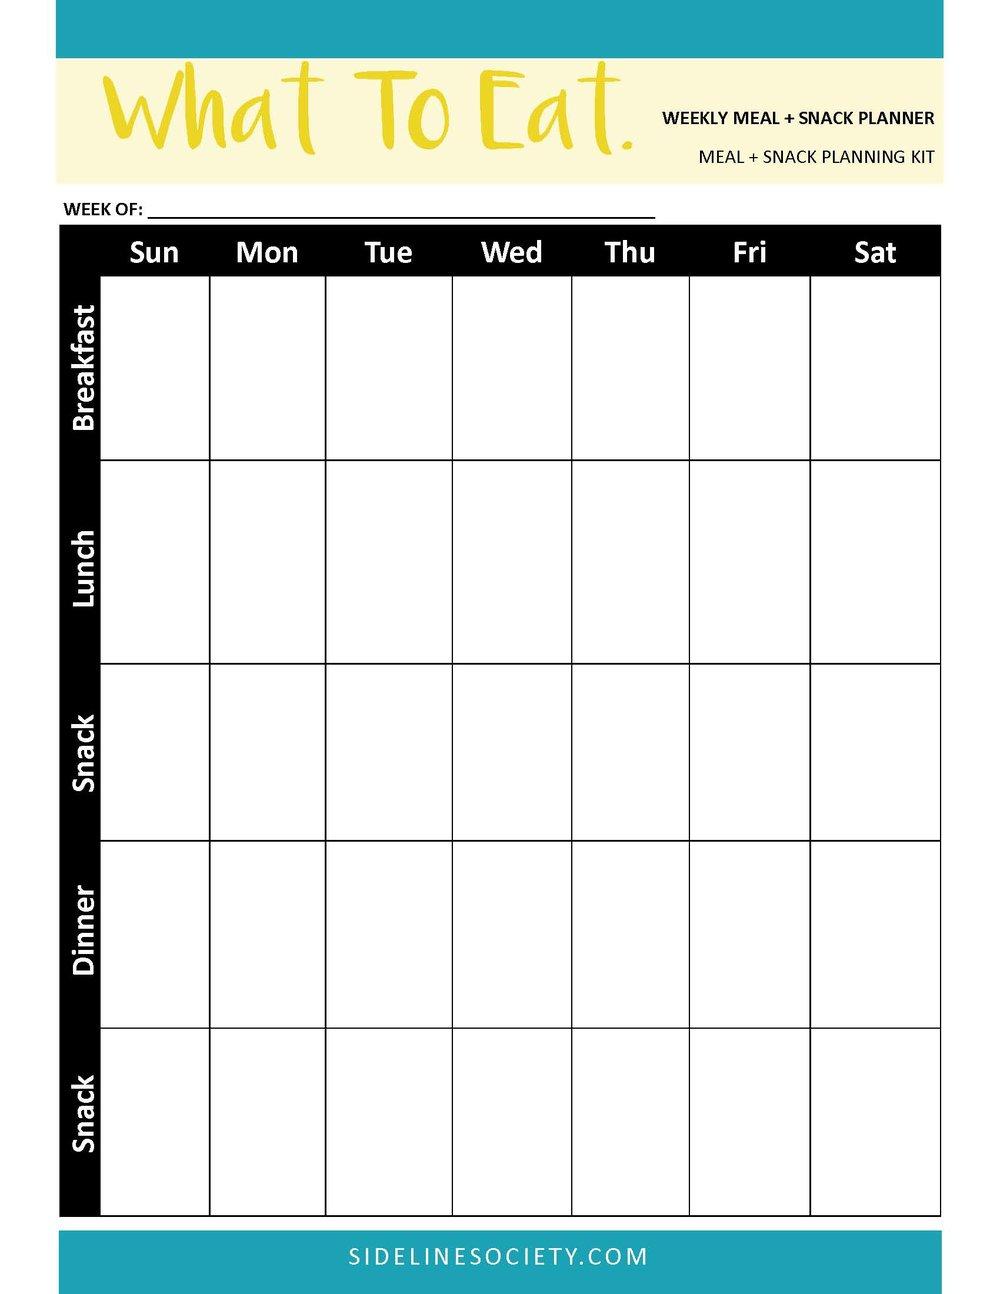 Weekly Meal + Snack Planner